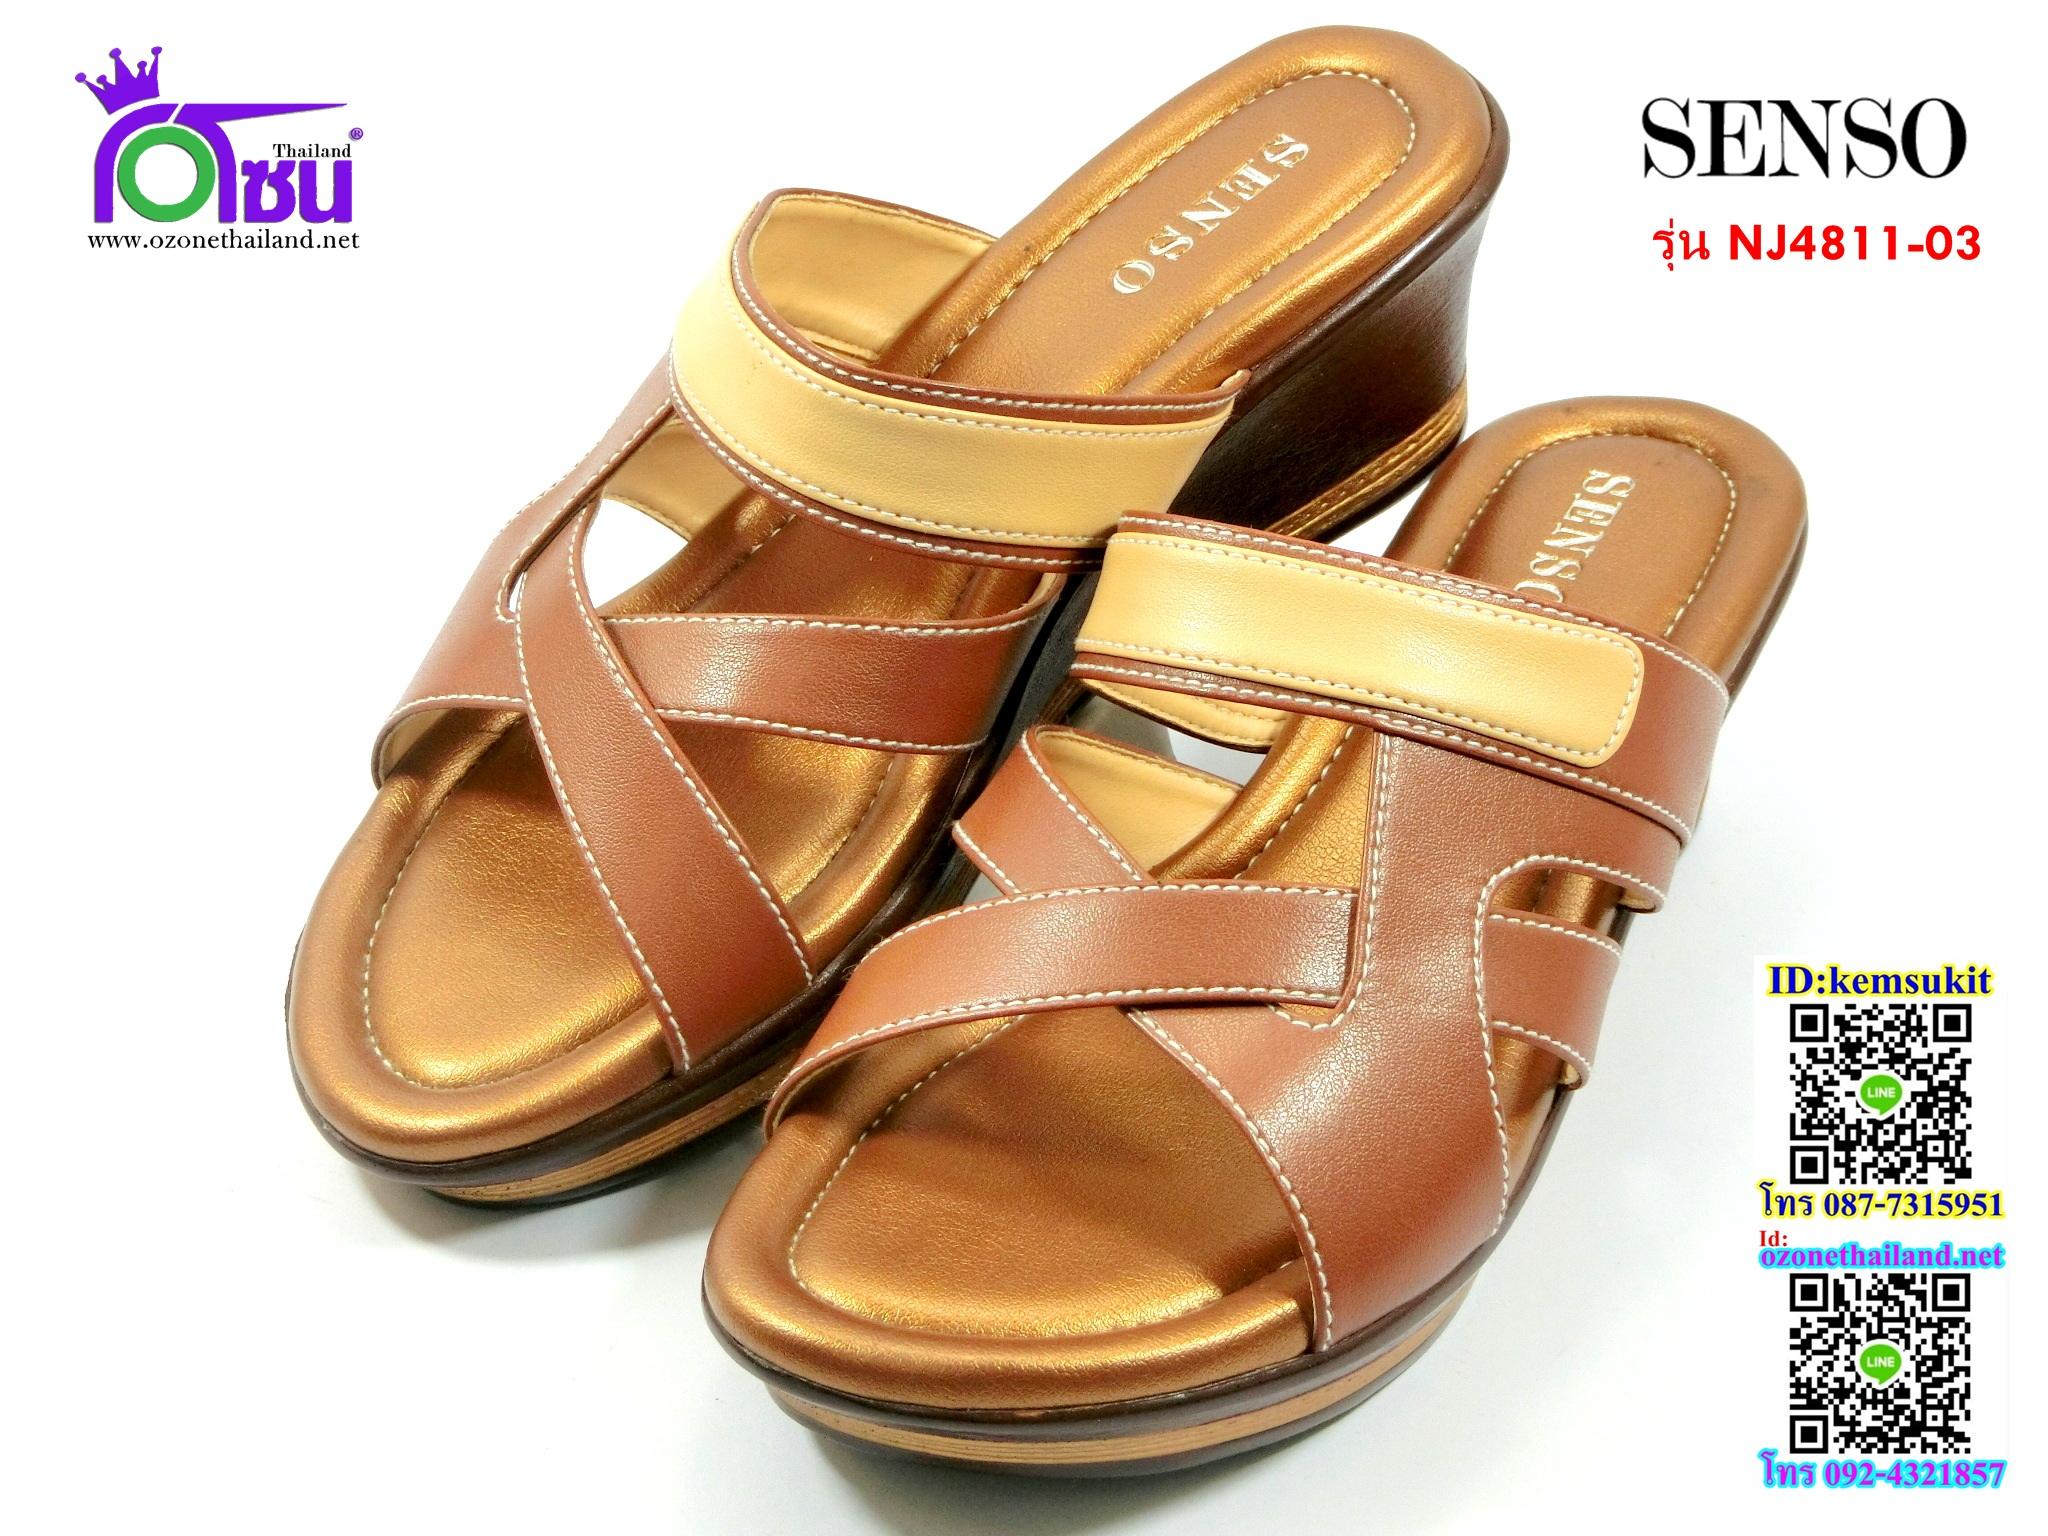 senso (เซนโซ) สีน้ำตาล รุ่นNJ48011-03 เบอร์36-40